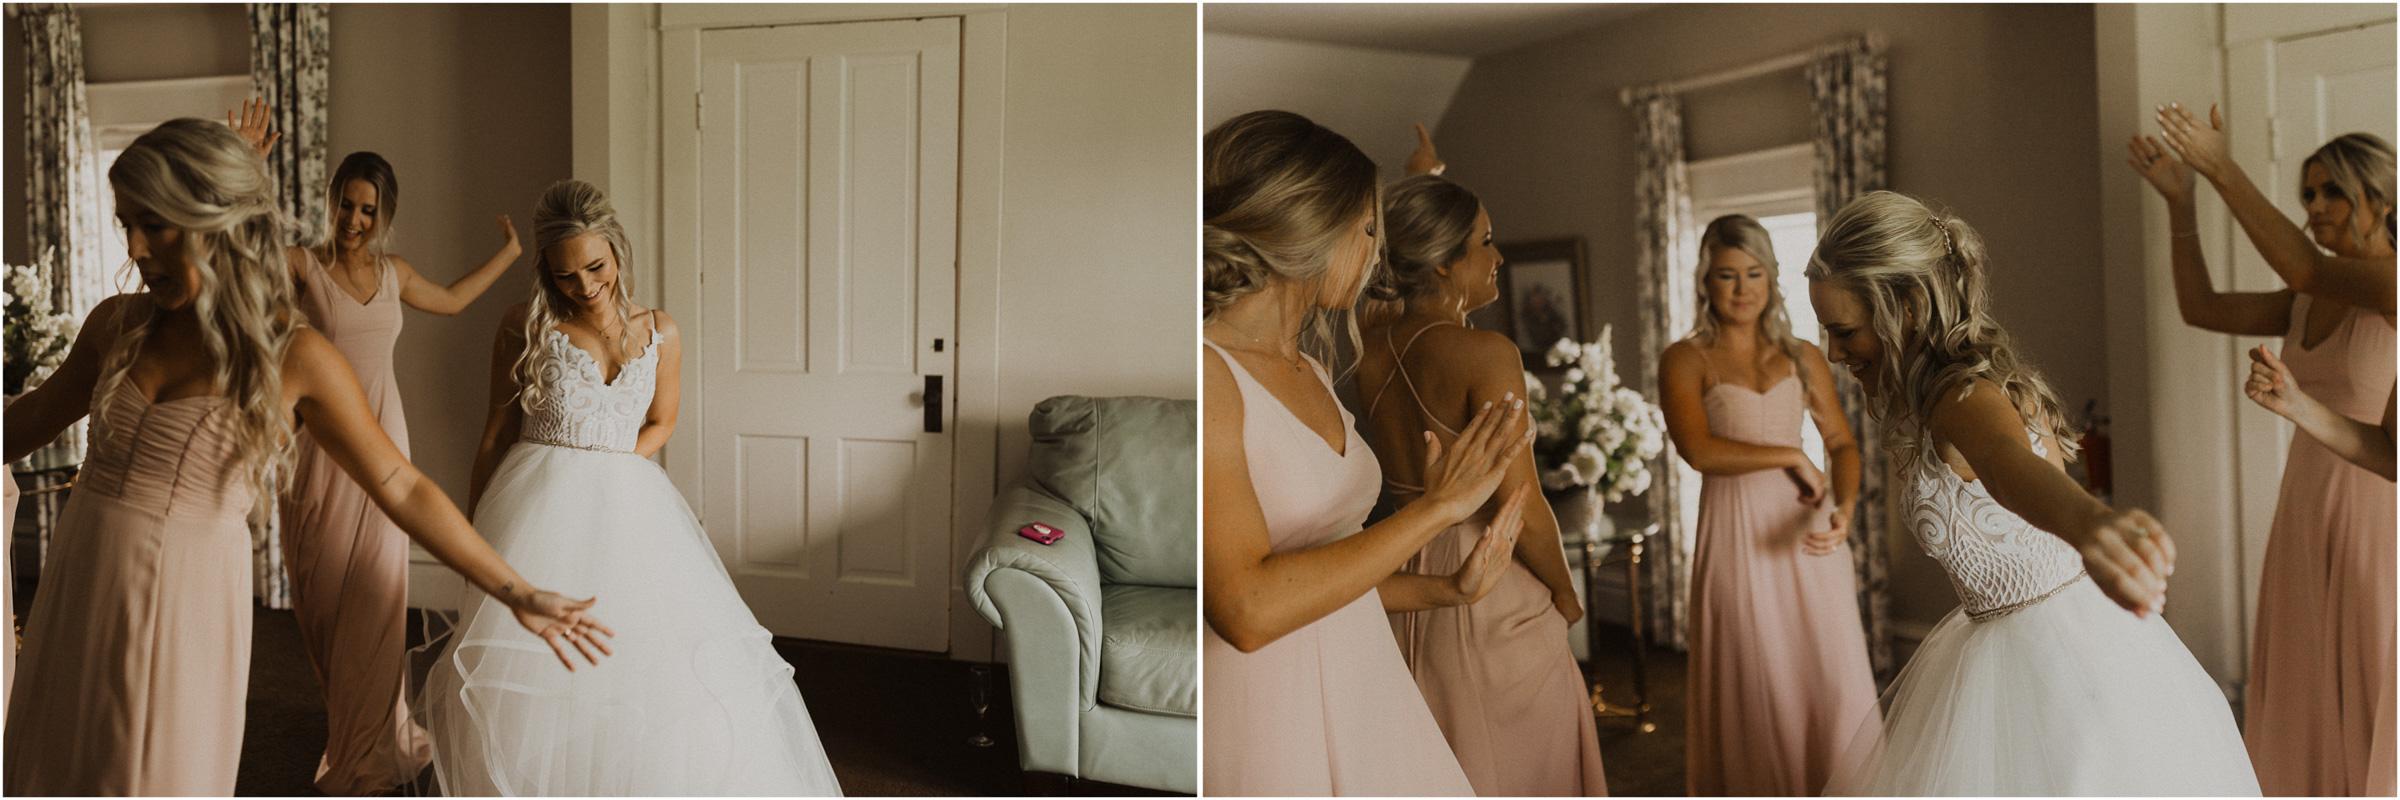 alyssa barletter photography hawthorne house summer outdoor wedding southern charm inspiration-12.jpg